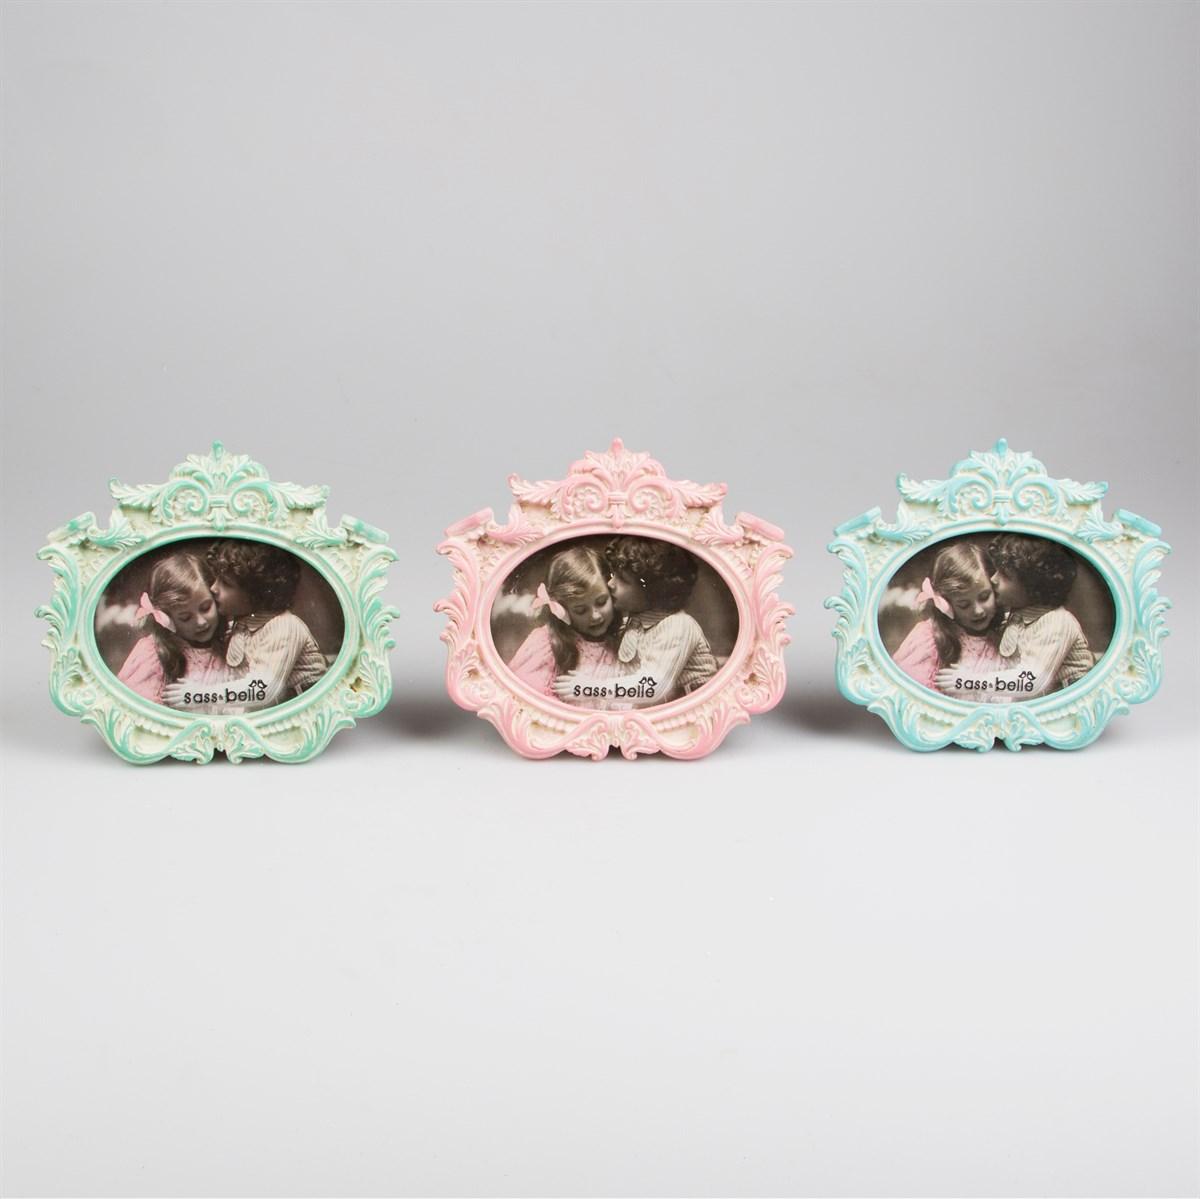 shabby chic photo frames, I want a shabbu chic gift photo frame, roccoco style ornaments, pastel prettiness